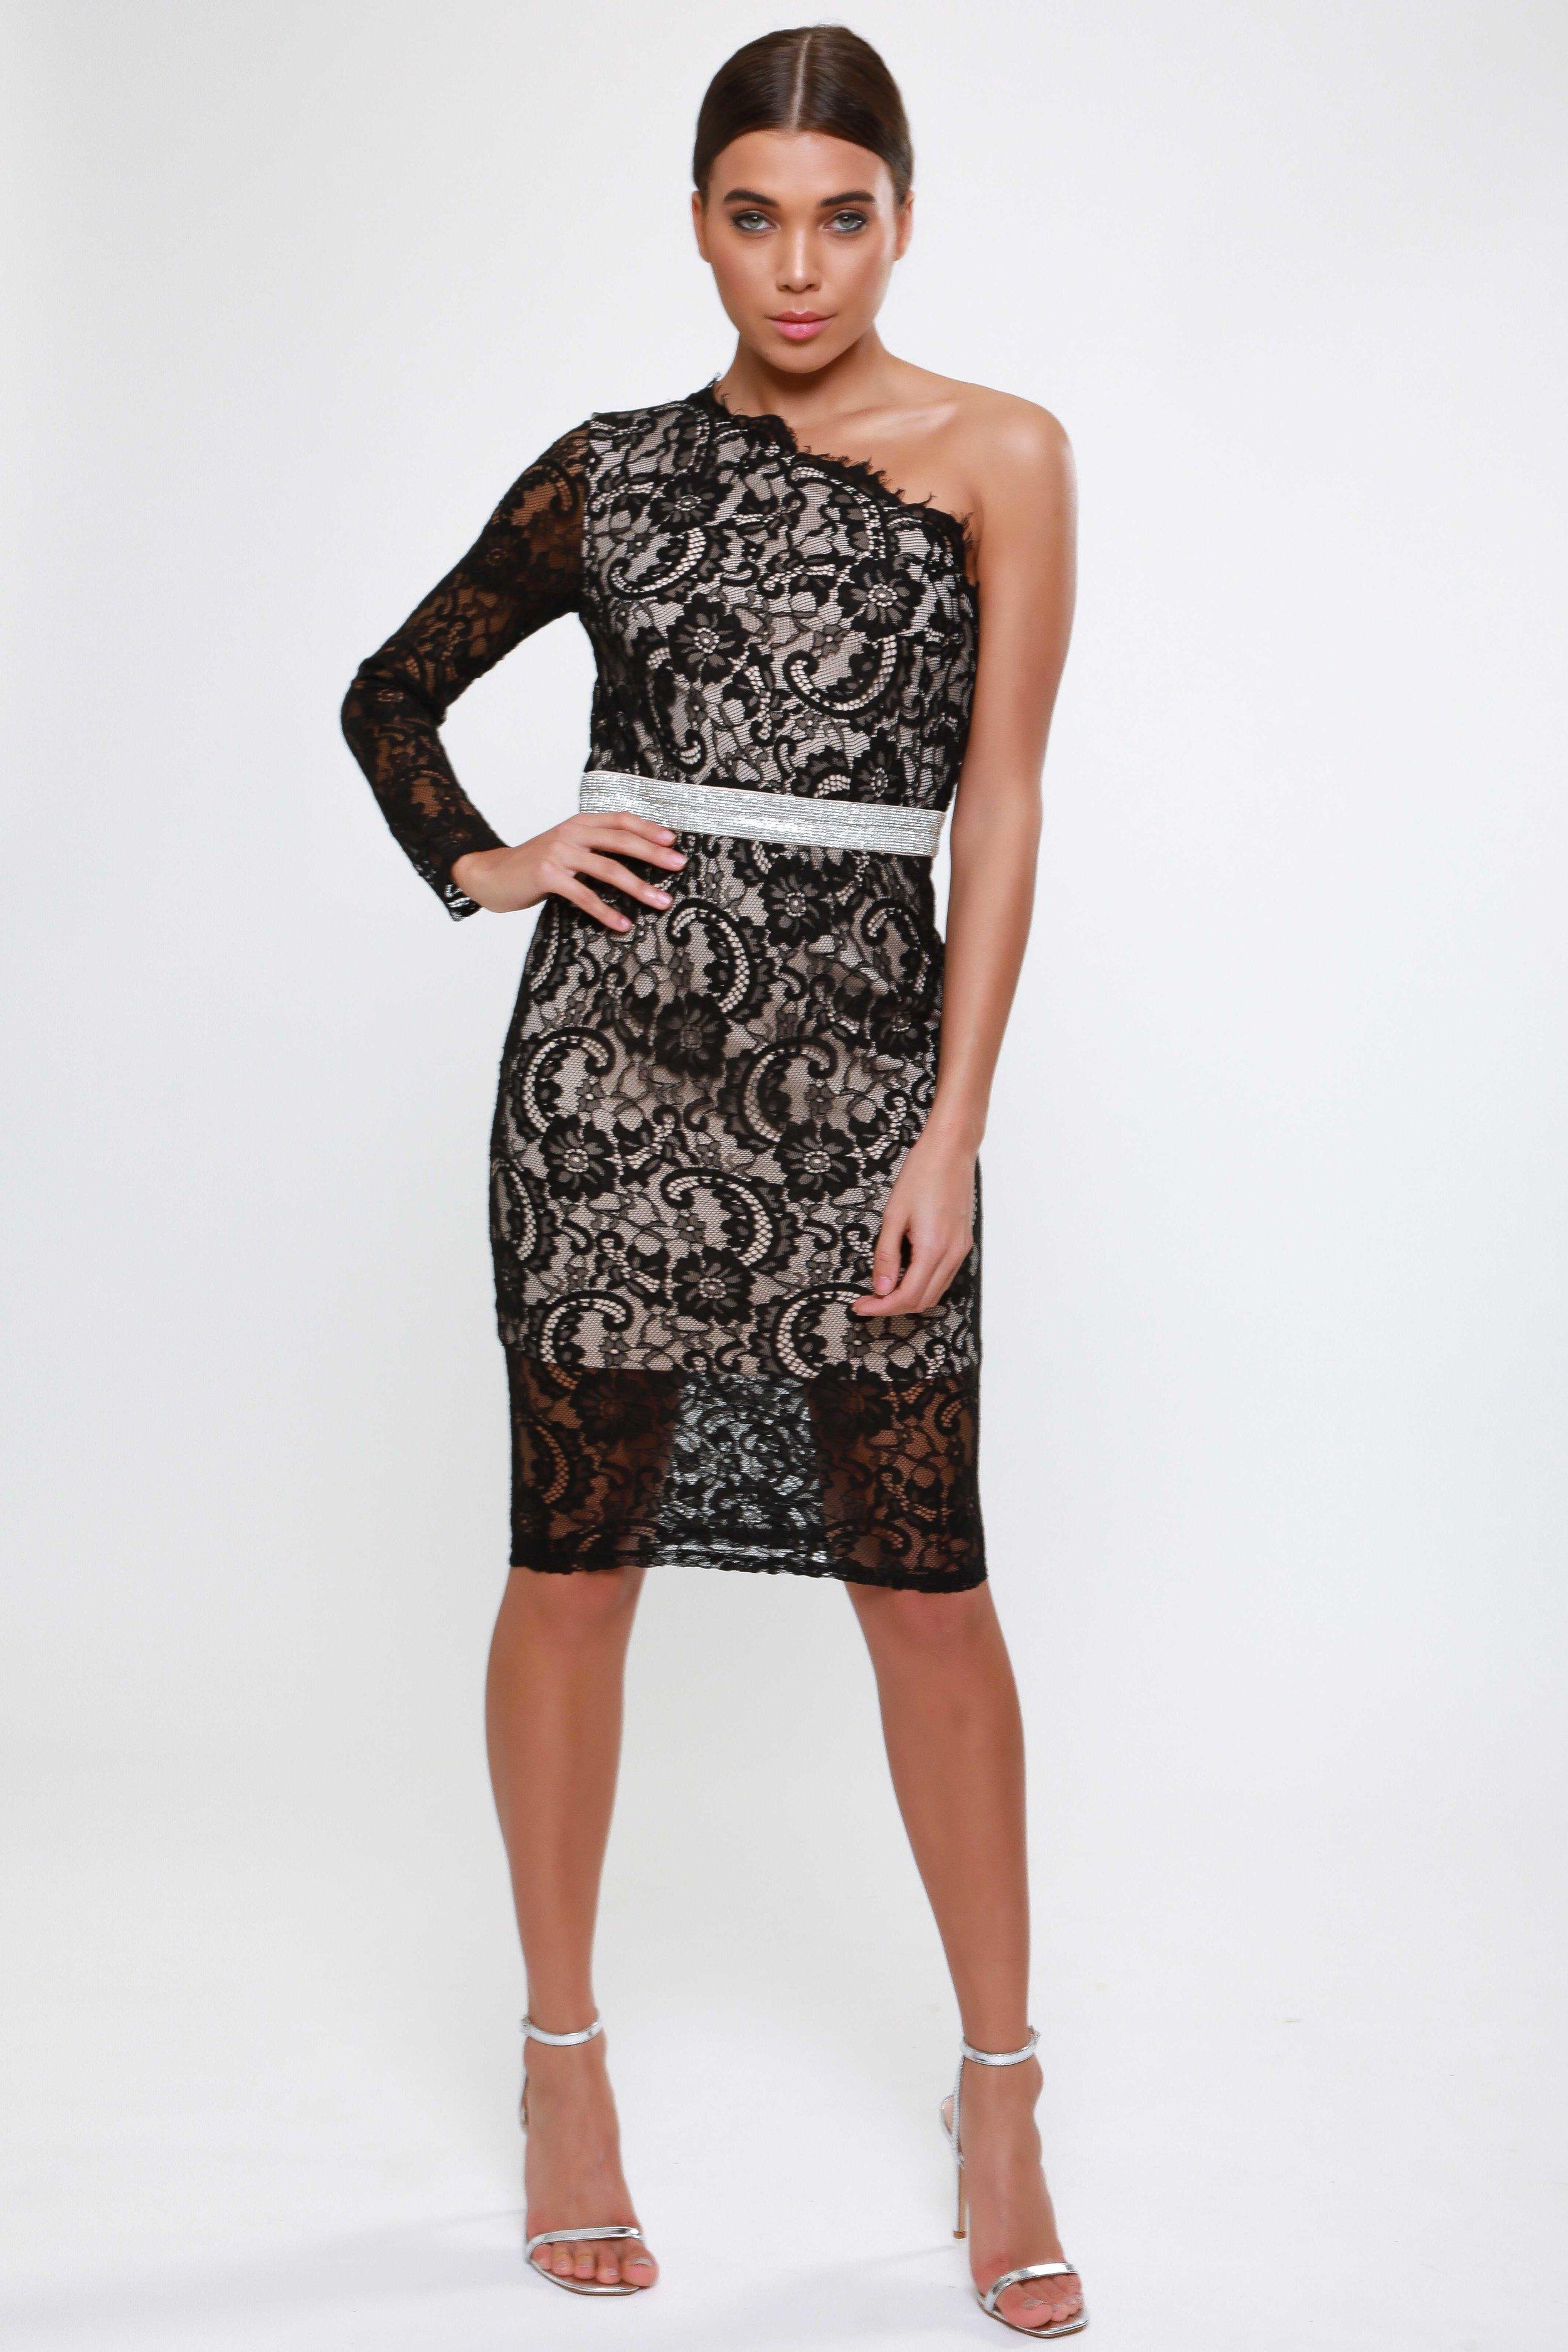 Scalloped Lace Obne  Shoulder Midi Dress   £65.00